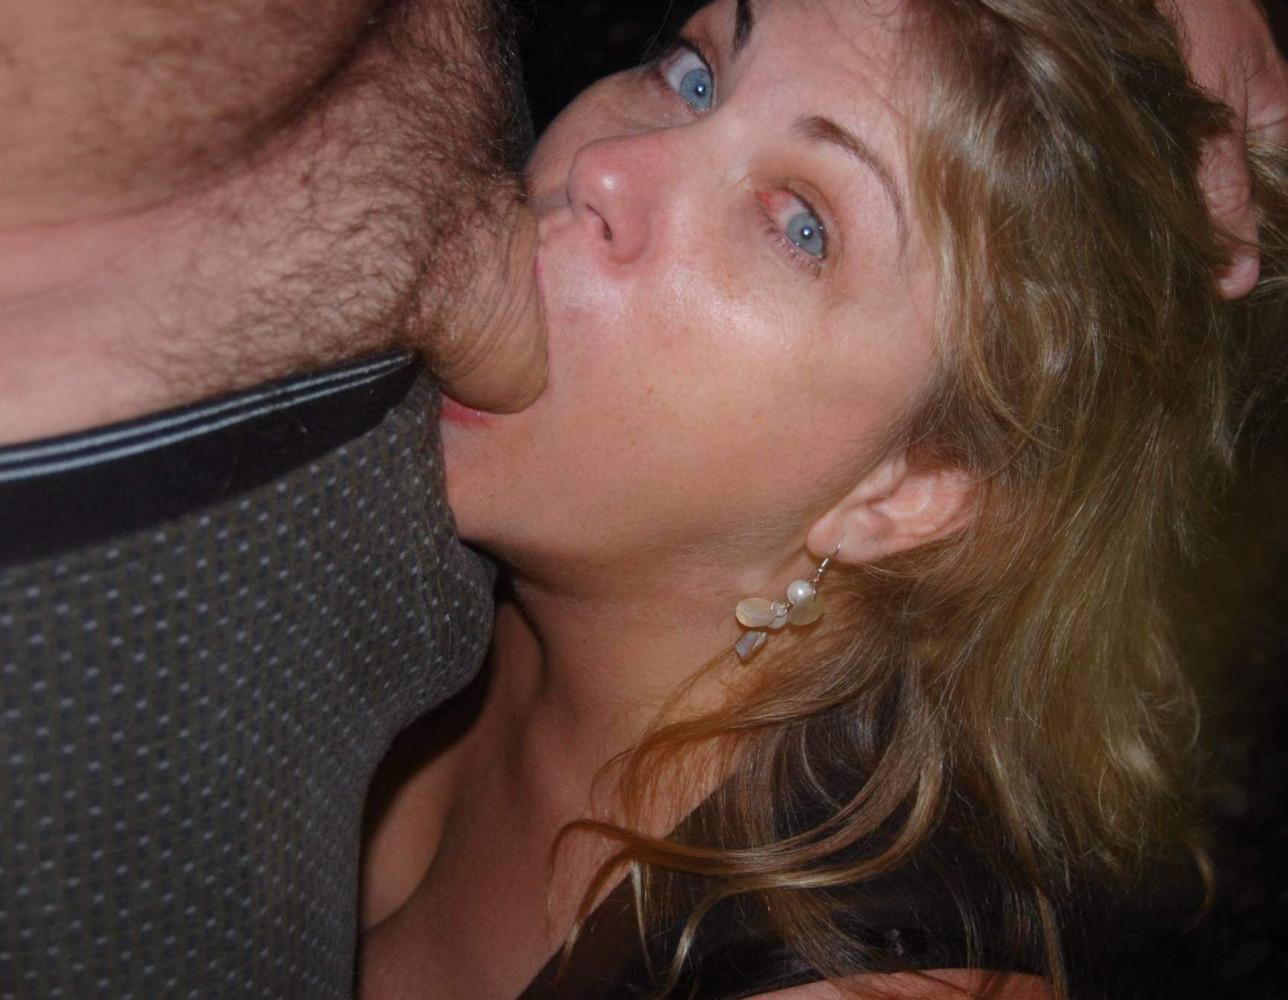 Talented Slut Girl Giving A Breathtaking Double Blowjob In A Porn Pov Vid, Free Porn